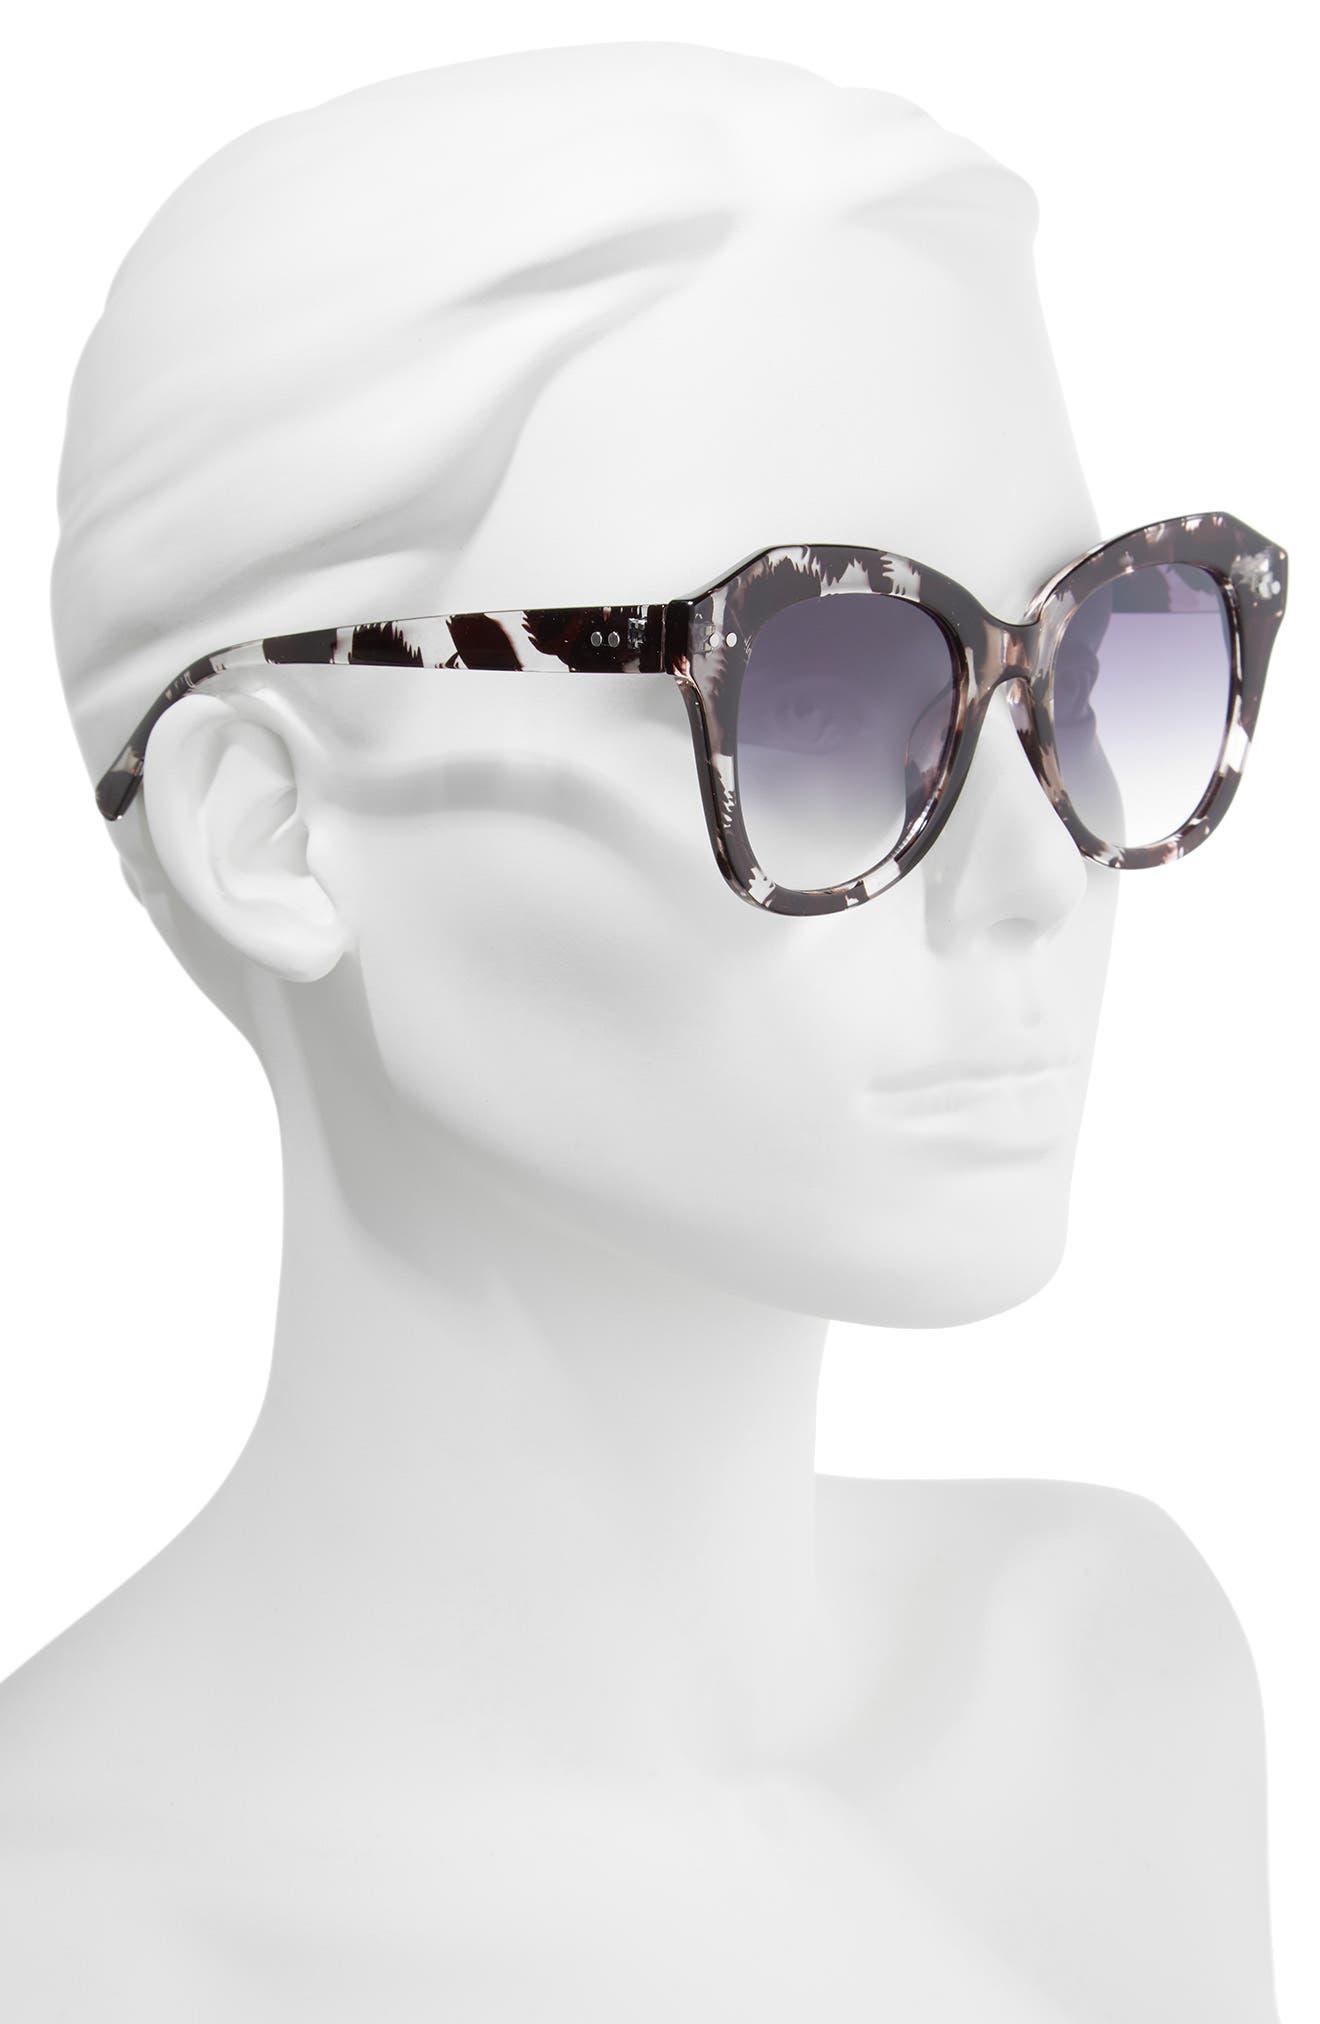 Marbled Square Sunglasses,                             Alternate thumbnail 2, color,                             001